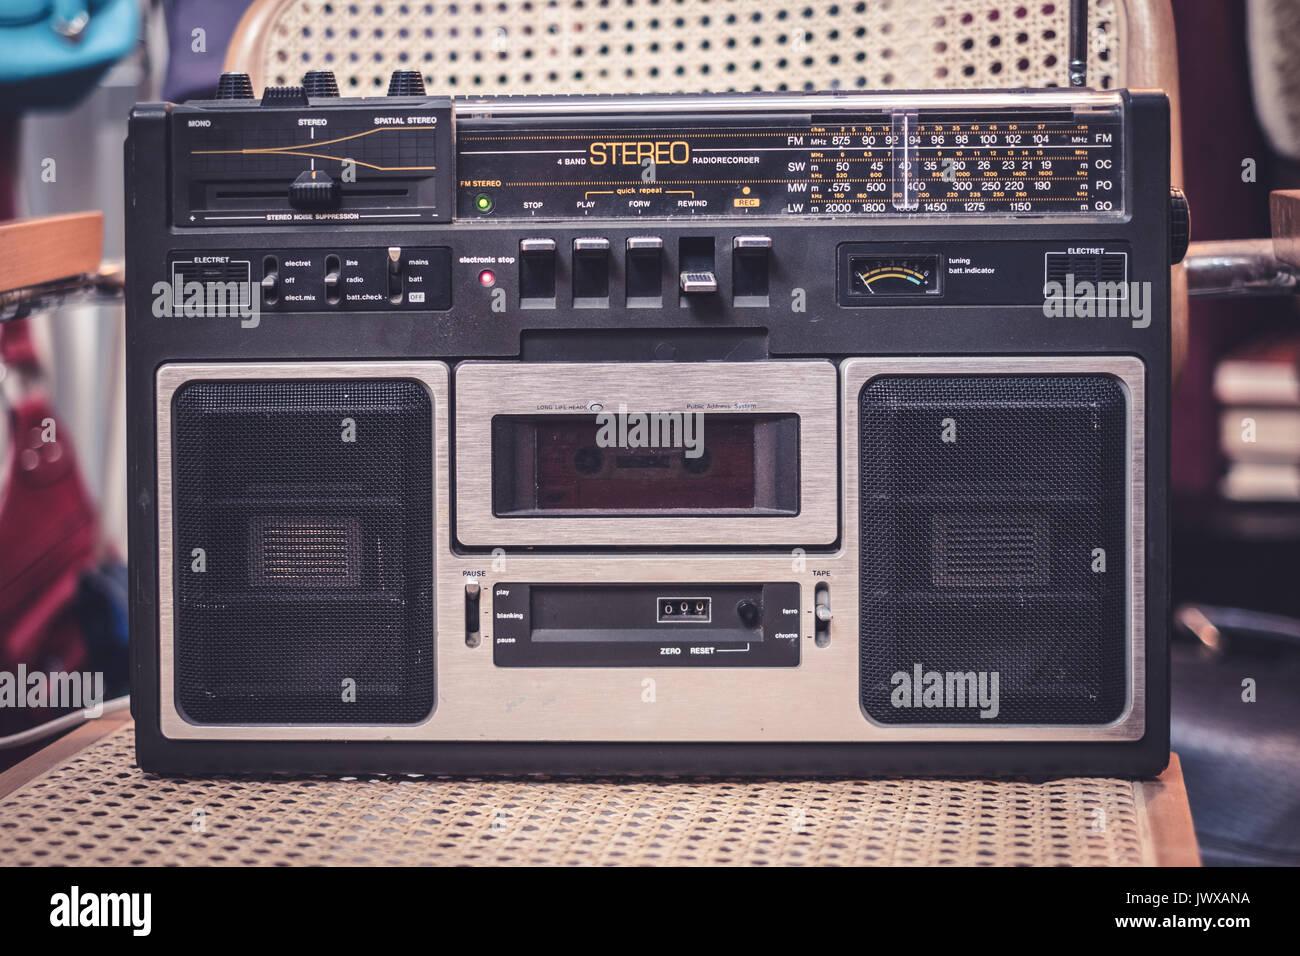 cassette recorder / audio player - 80s radio - Stock Image